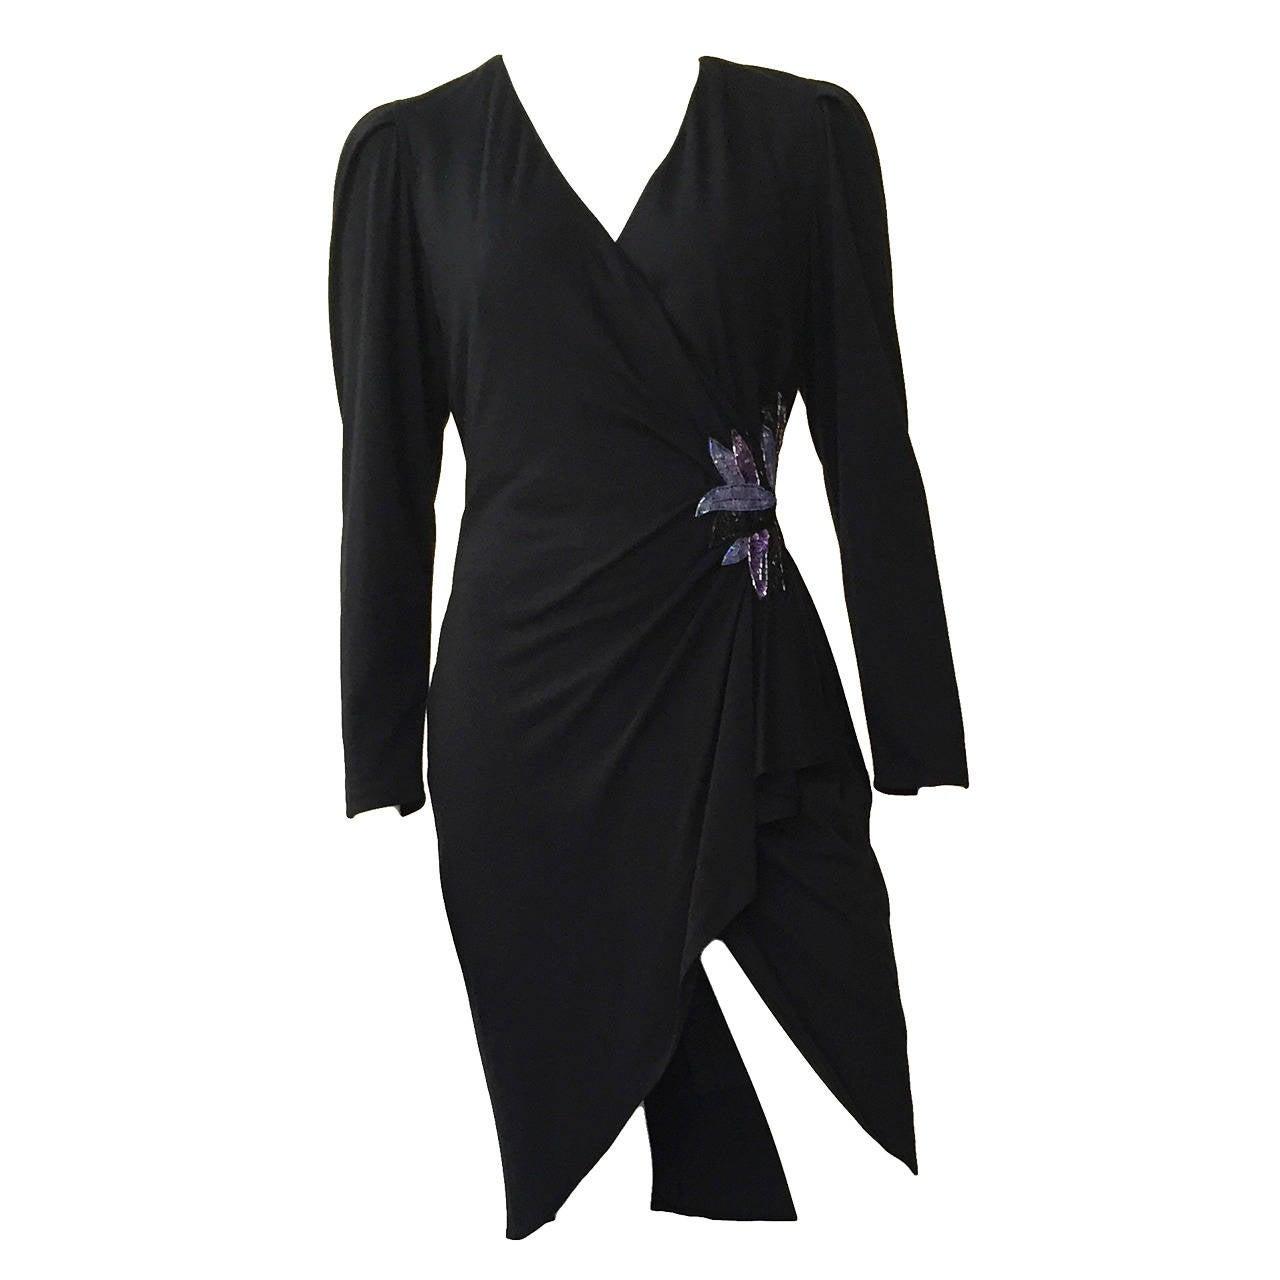 Zandra Rhodes 1980s Black with Sequin Dress Size 6.